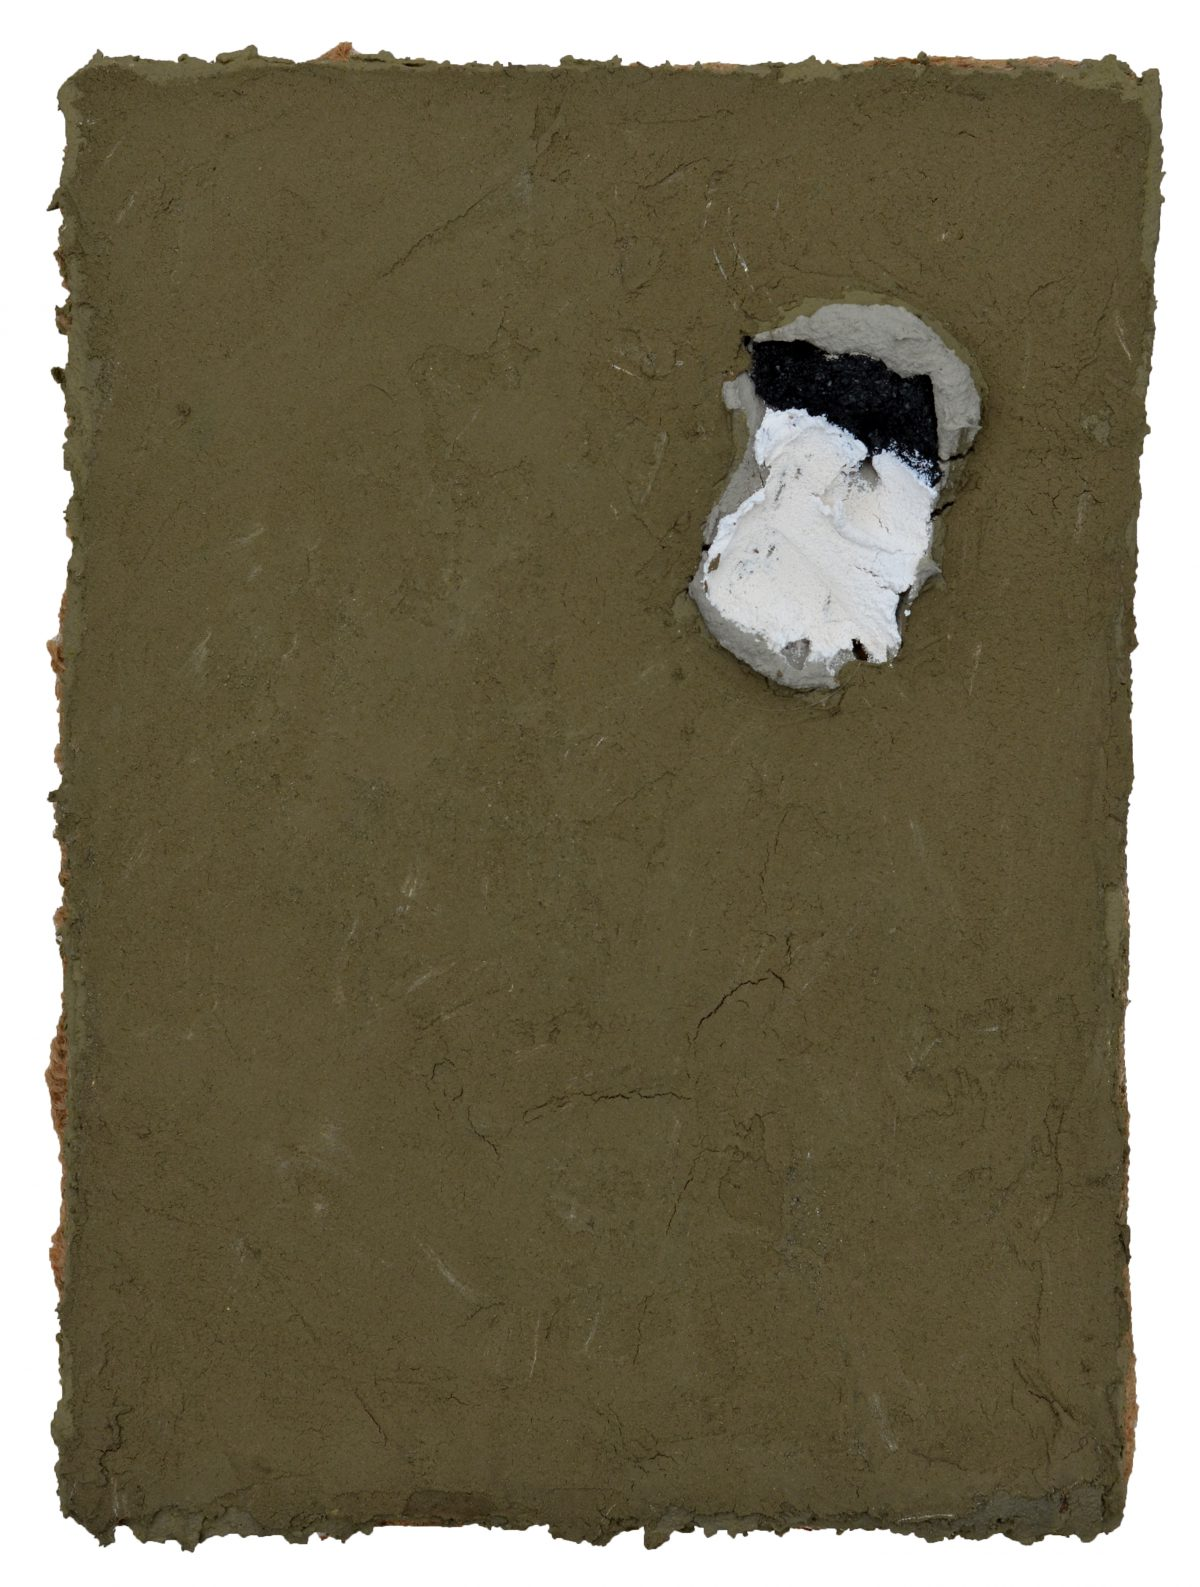 Angel Alonso - Terre d'Ombre naturelle - 22,5 x 16,5 cm - 1984